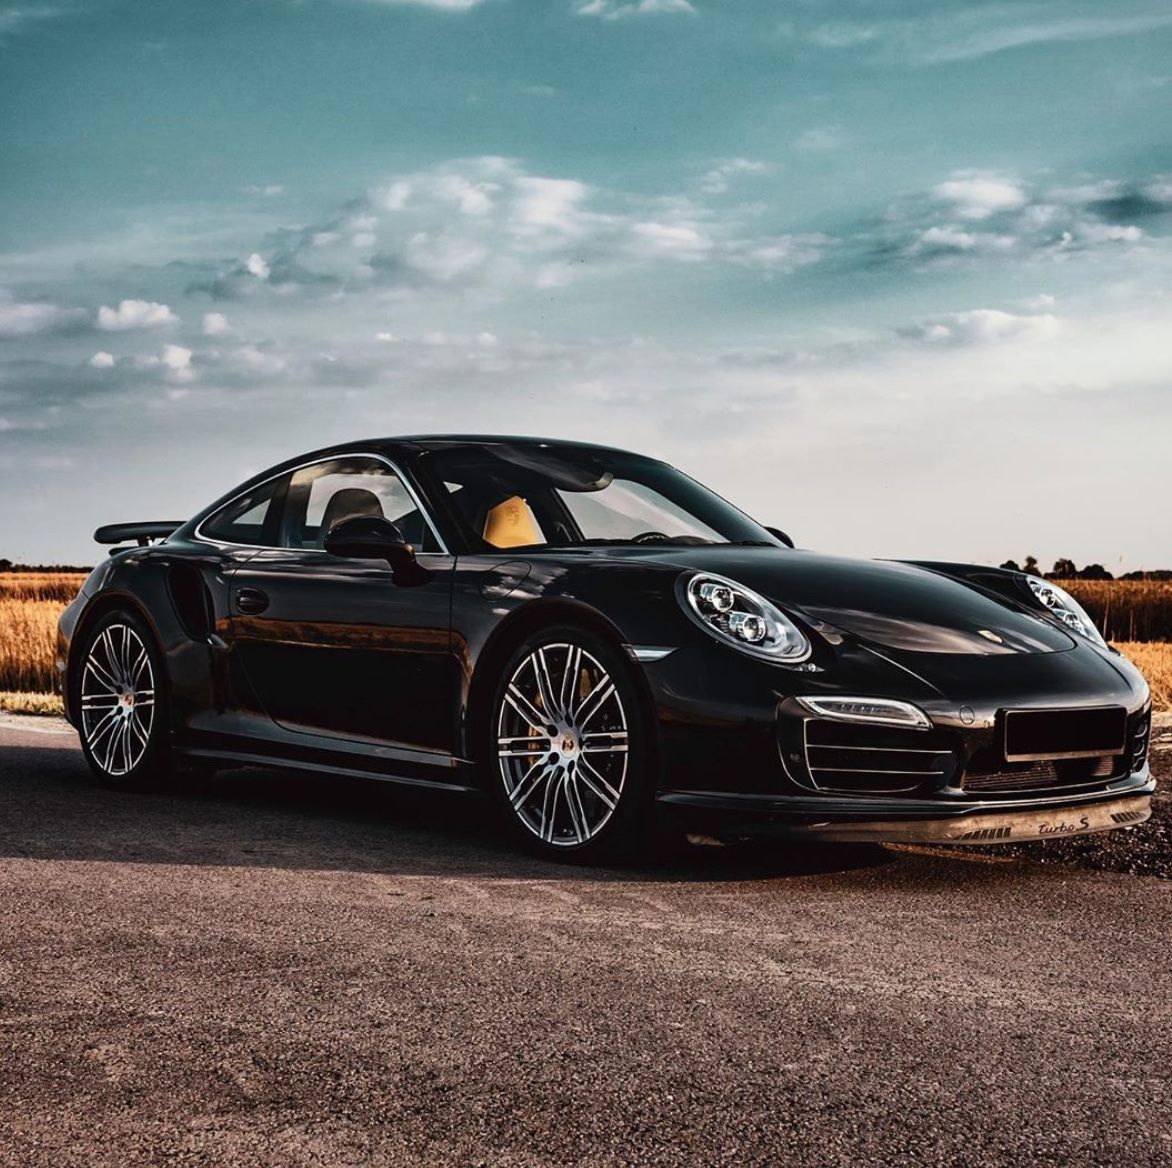 Most Expensive Porsche Car: Porsche 911, Porsche, Beautiful Cars